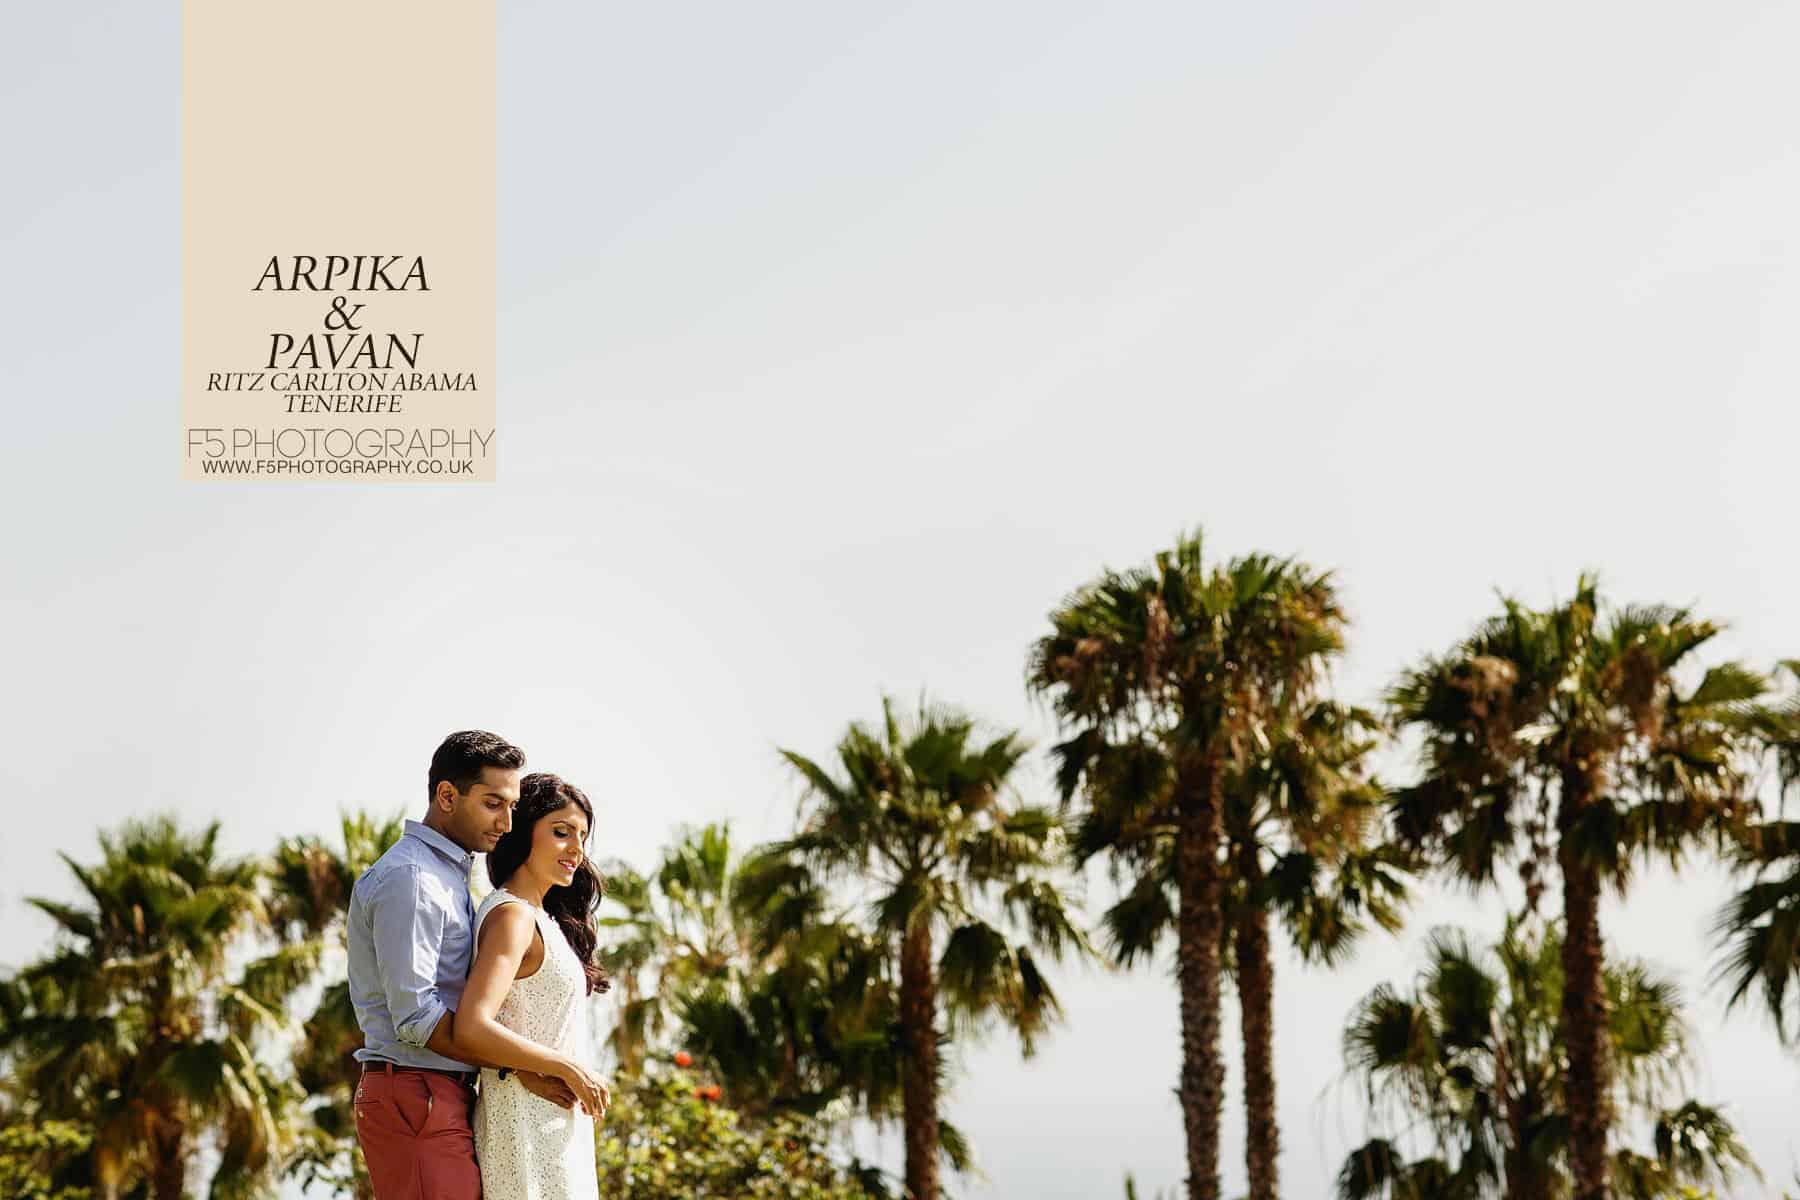 Ritz Carlton Abama Tenerife Wedding